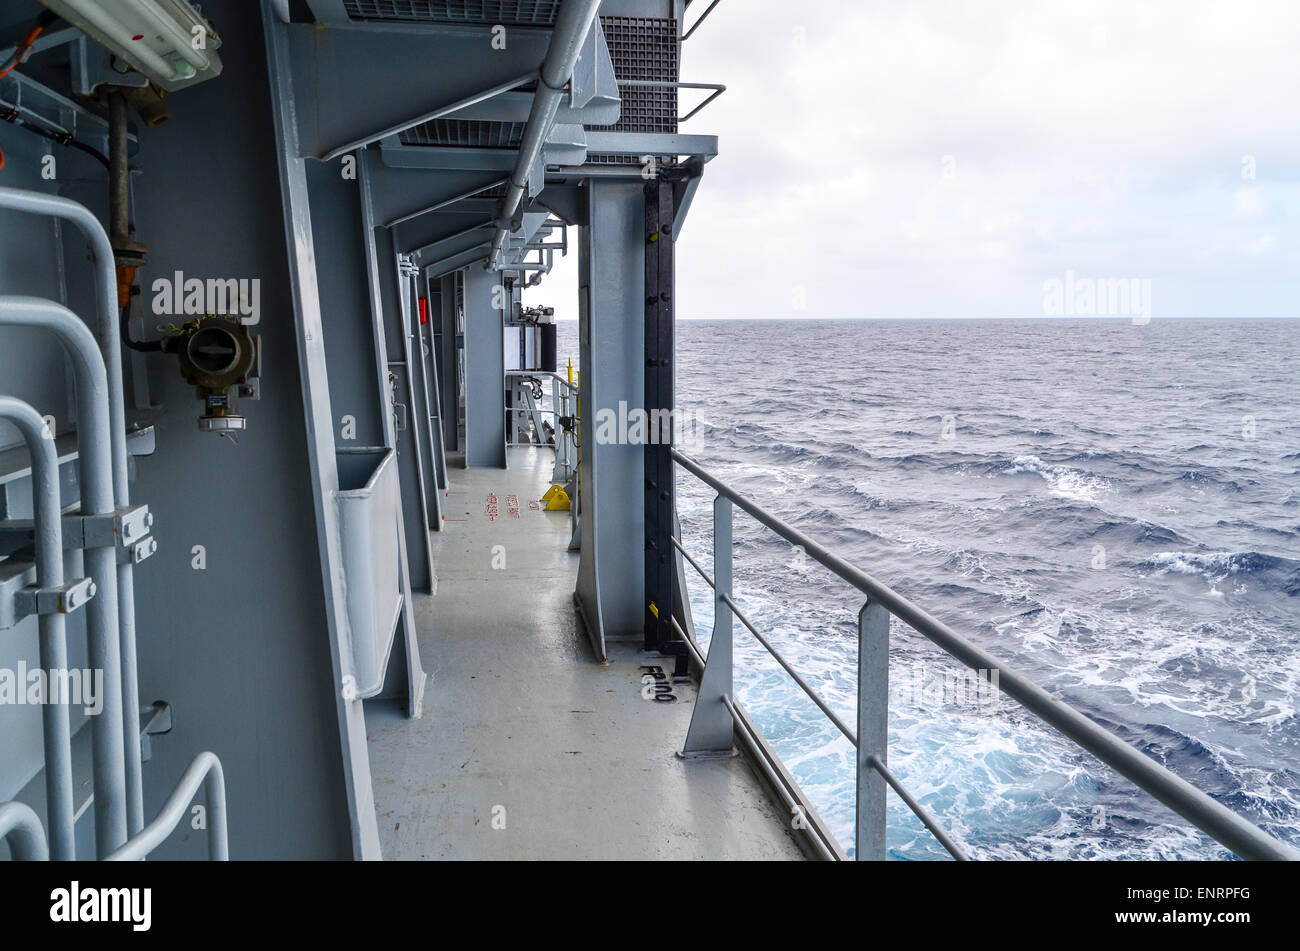 Cargo ship crusing in the ocean - Stock Image